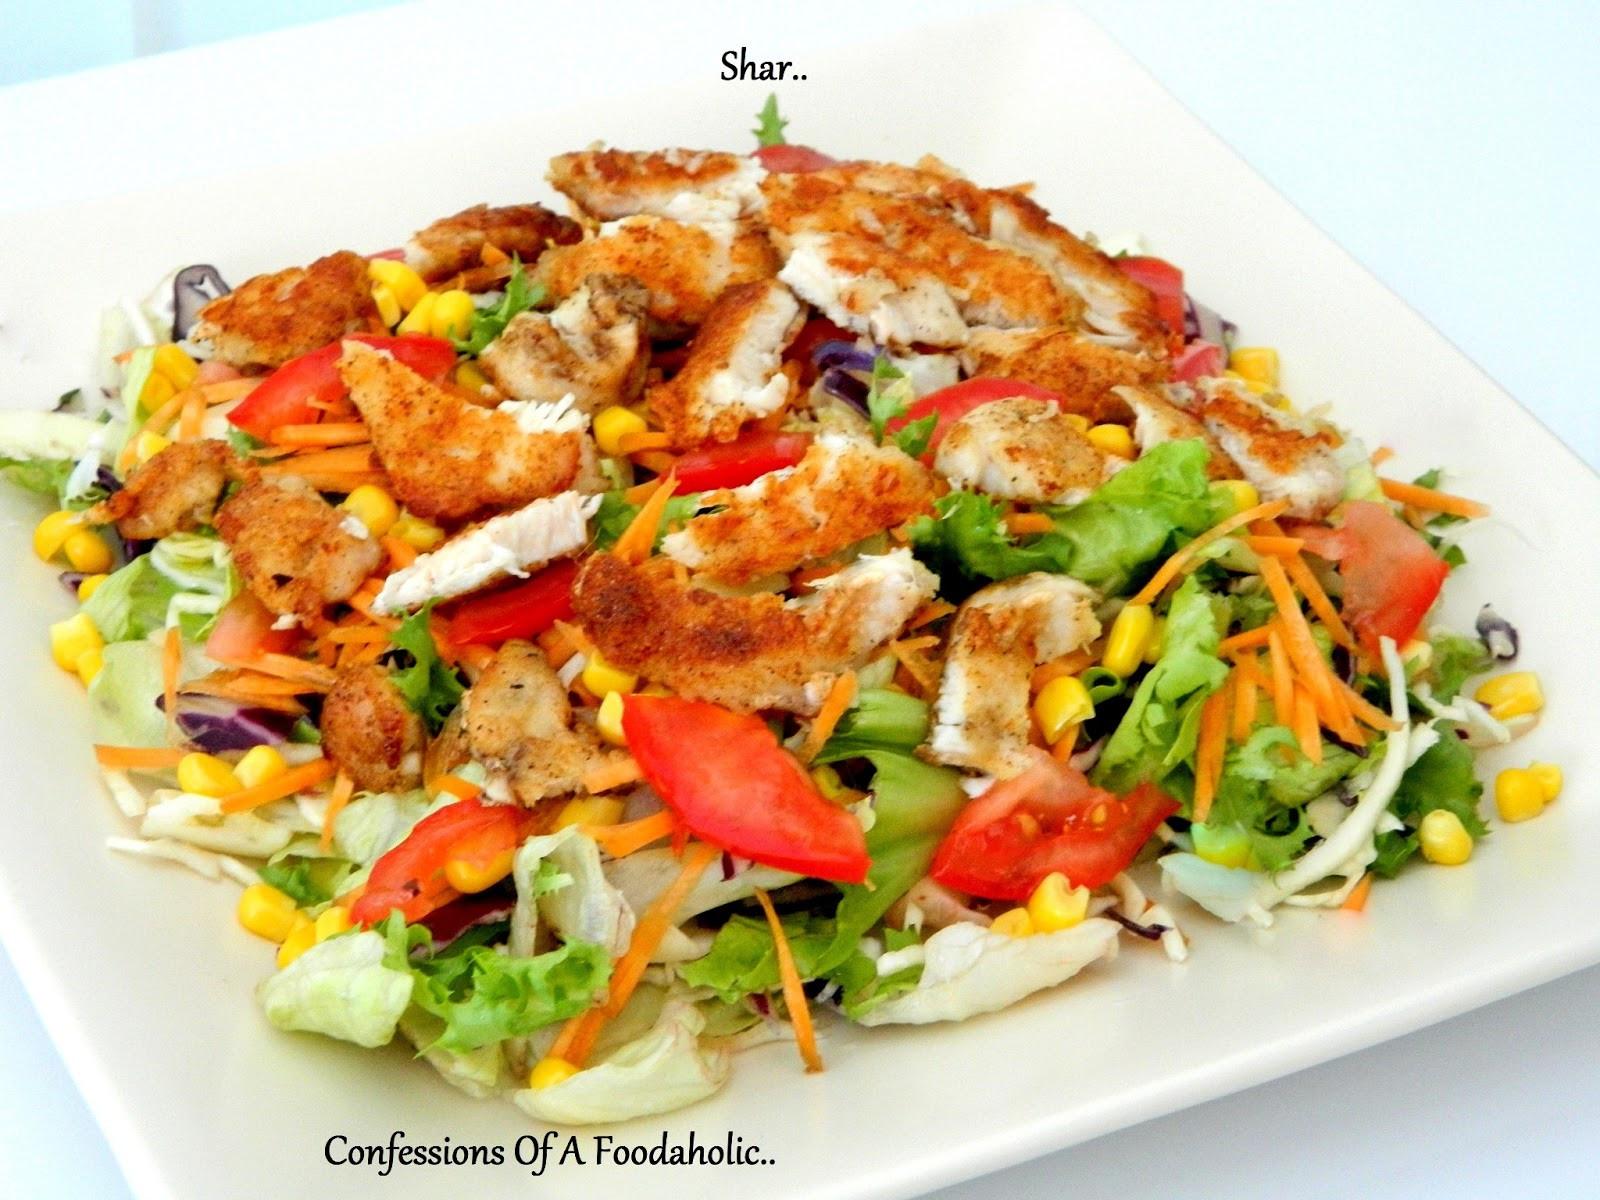 Crispy Chicken Salad  Confessions A Foodaholic Crispy chicken over bed of